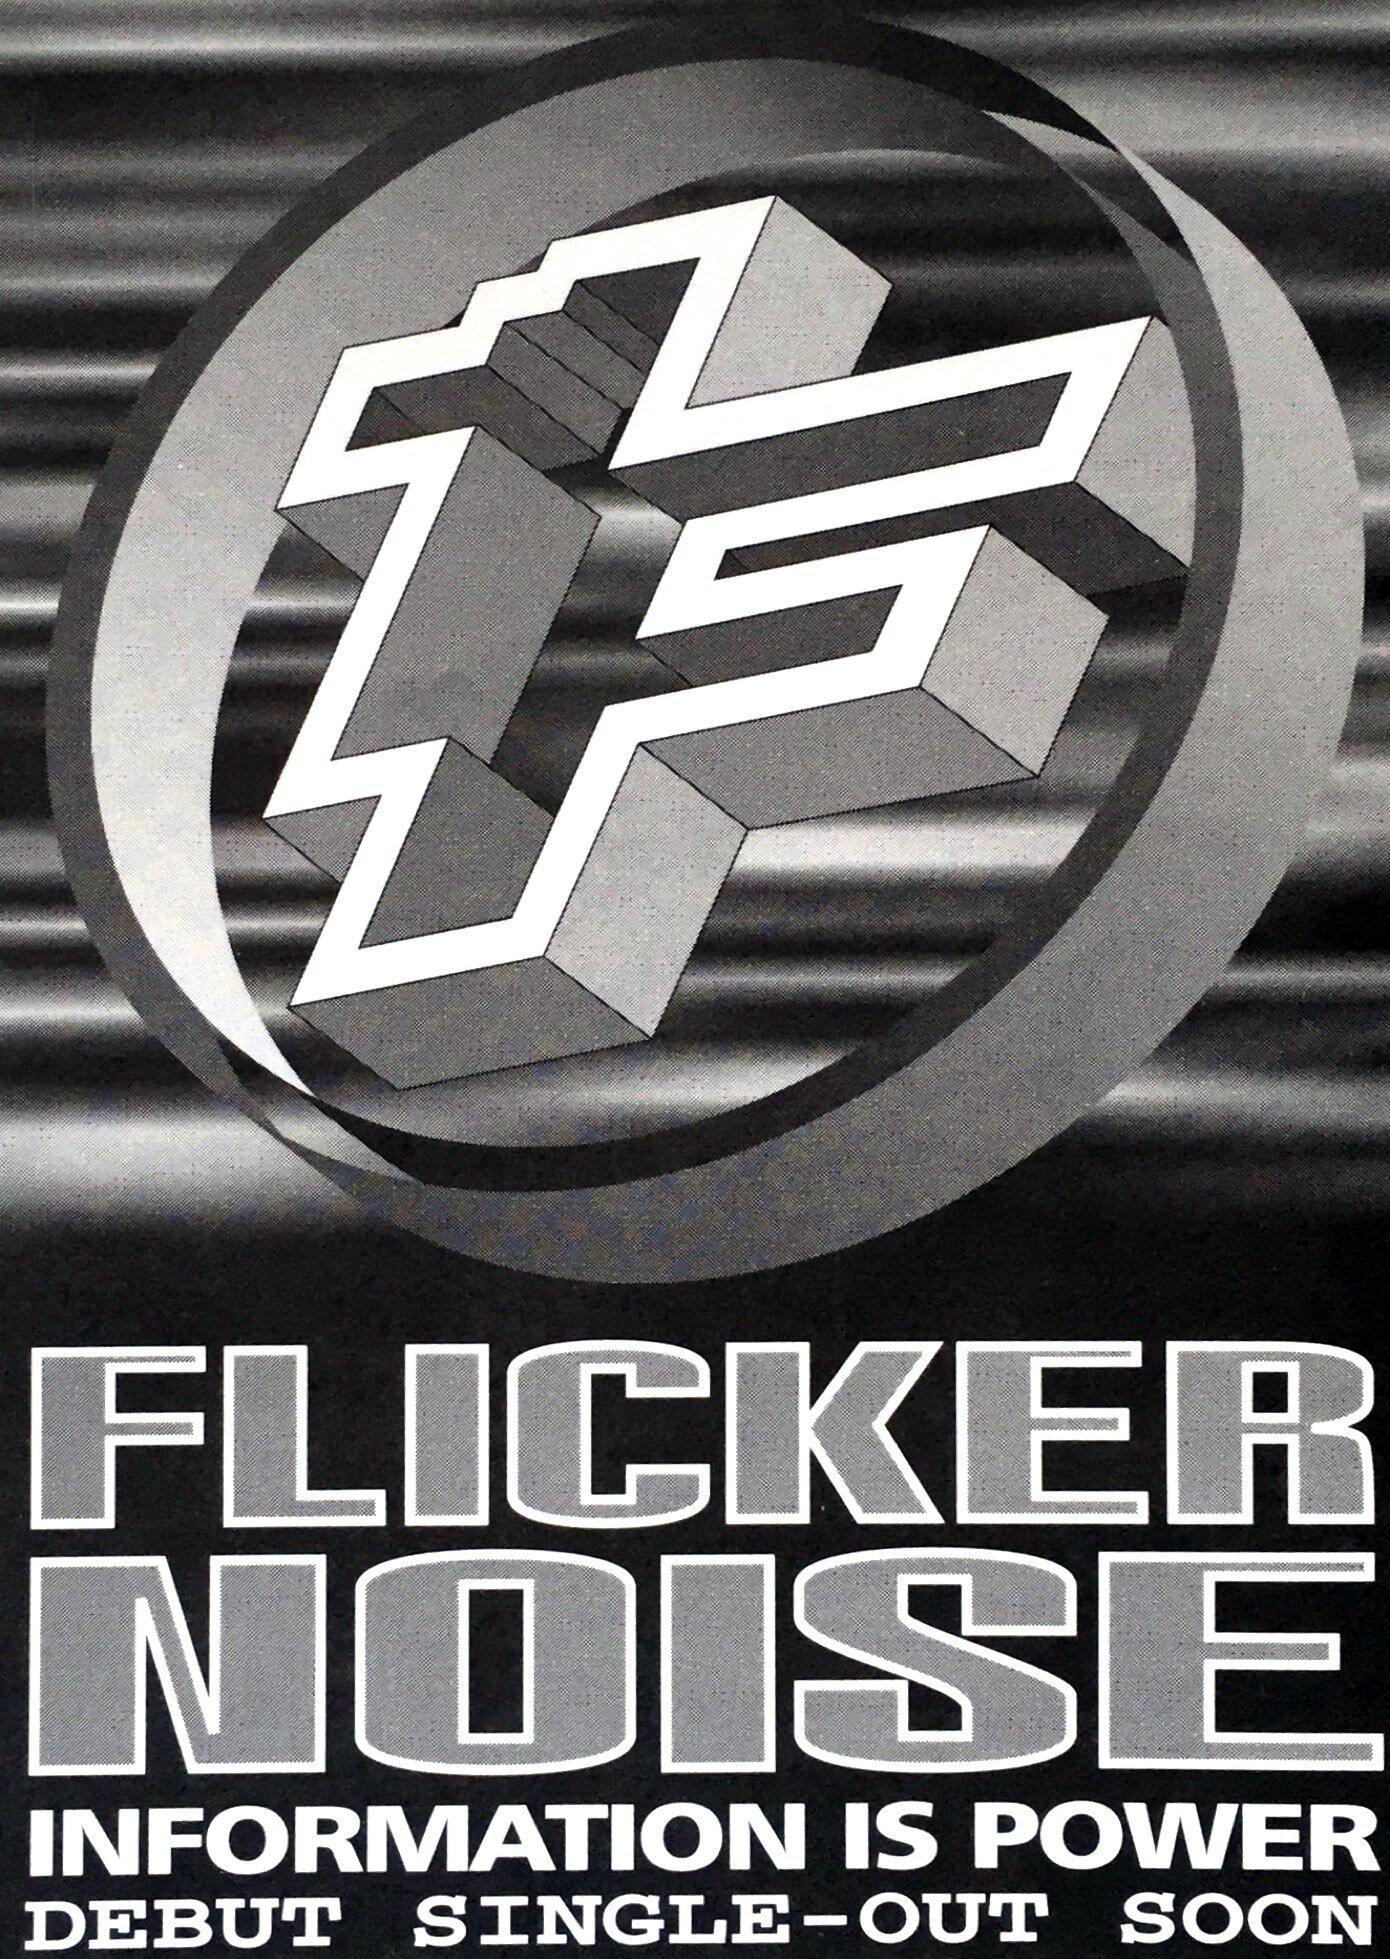 Flicker Noise Information Flyer.jpg